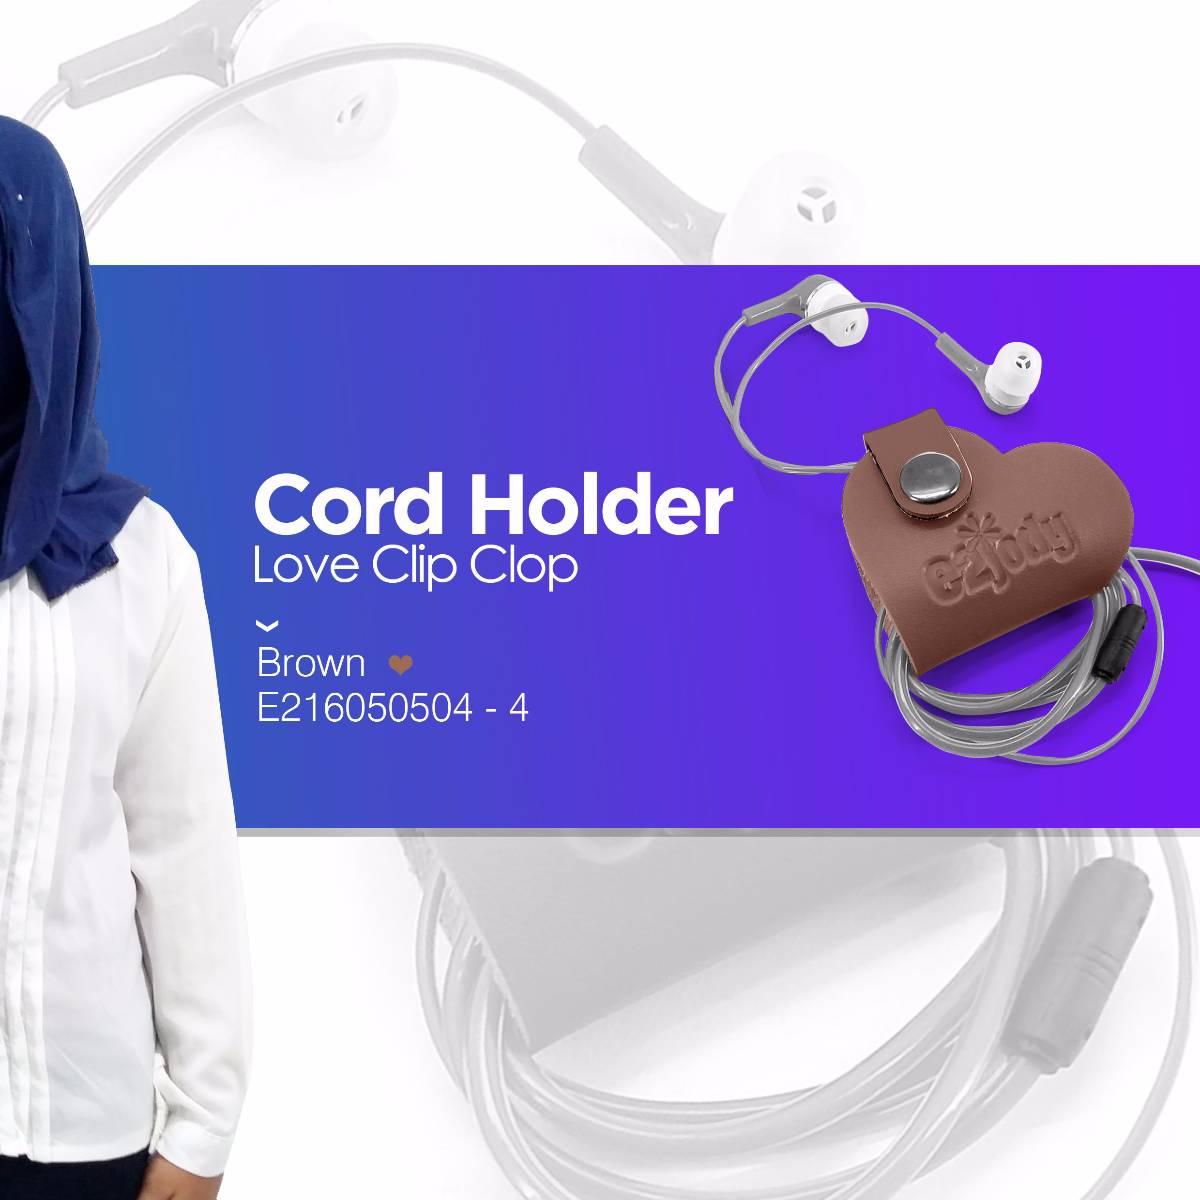 Cord Holder Love2